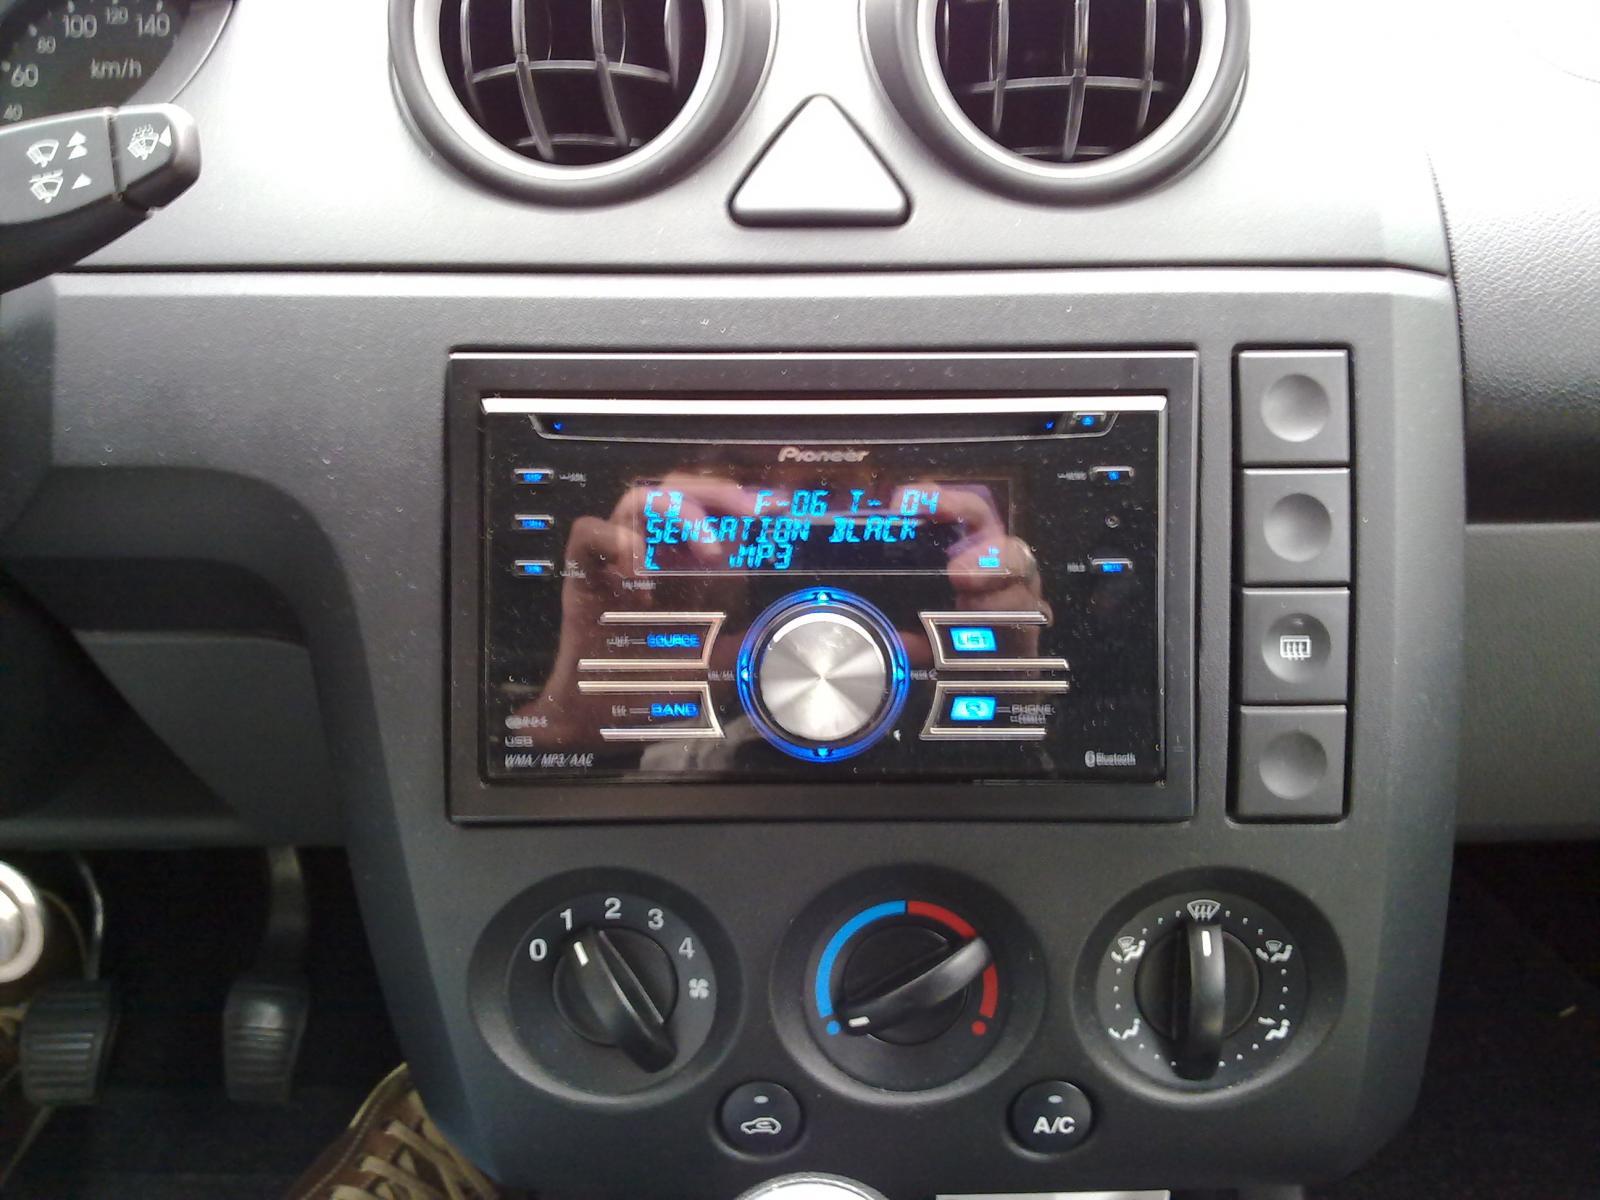 ford fiesta mk6 audio wiring diagram toyota yaris 2016 radio hatchback 2002 2008 features equipment